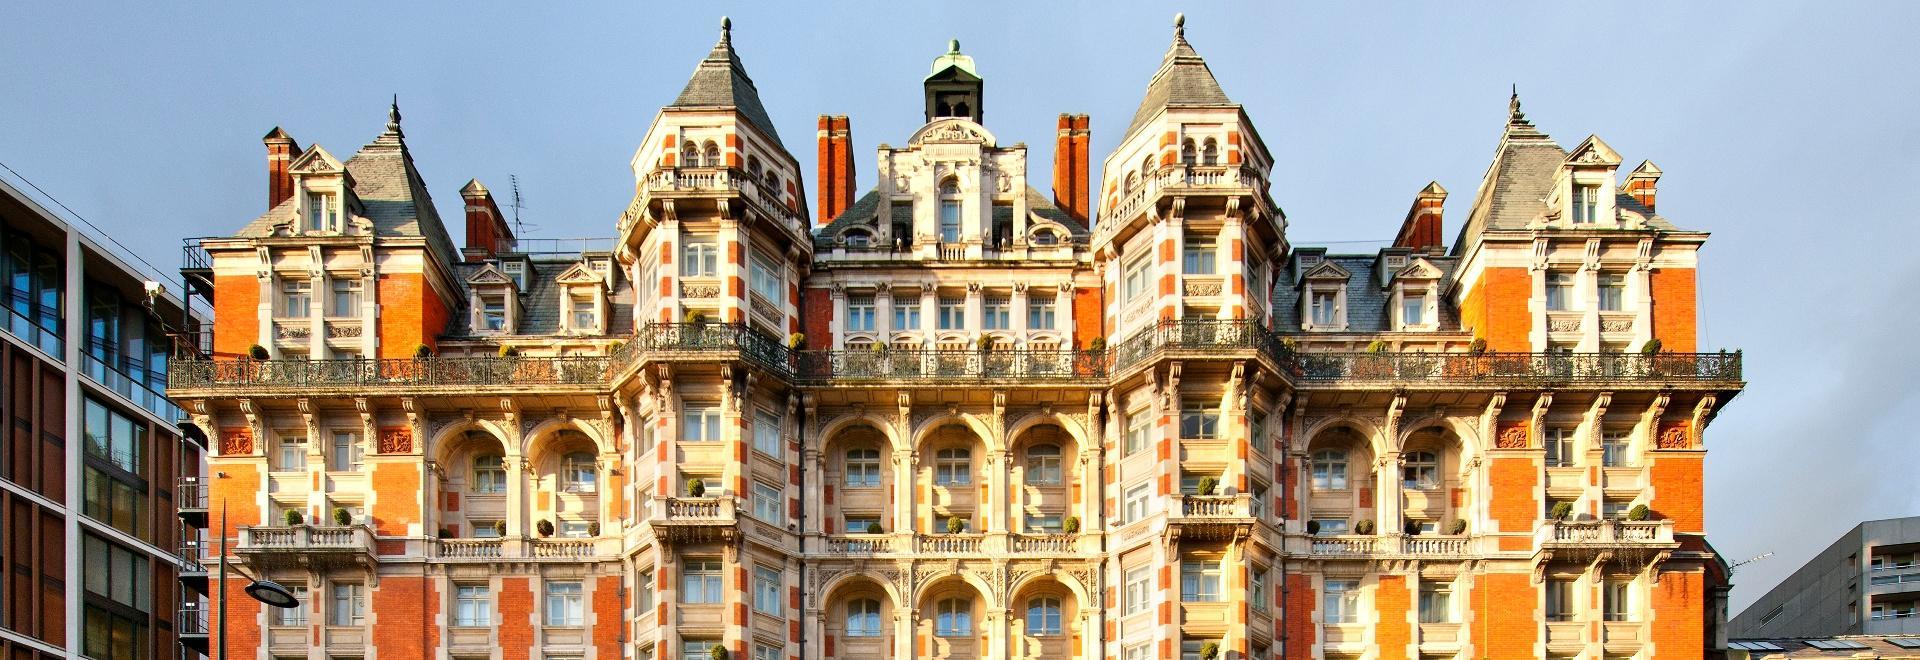 Cose da ricchi: hotel di lusso